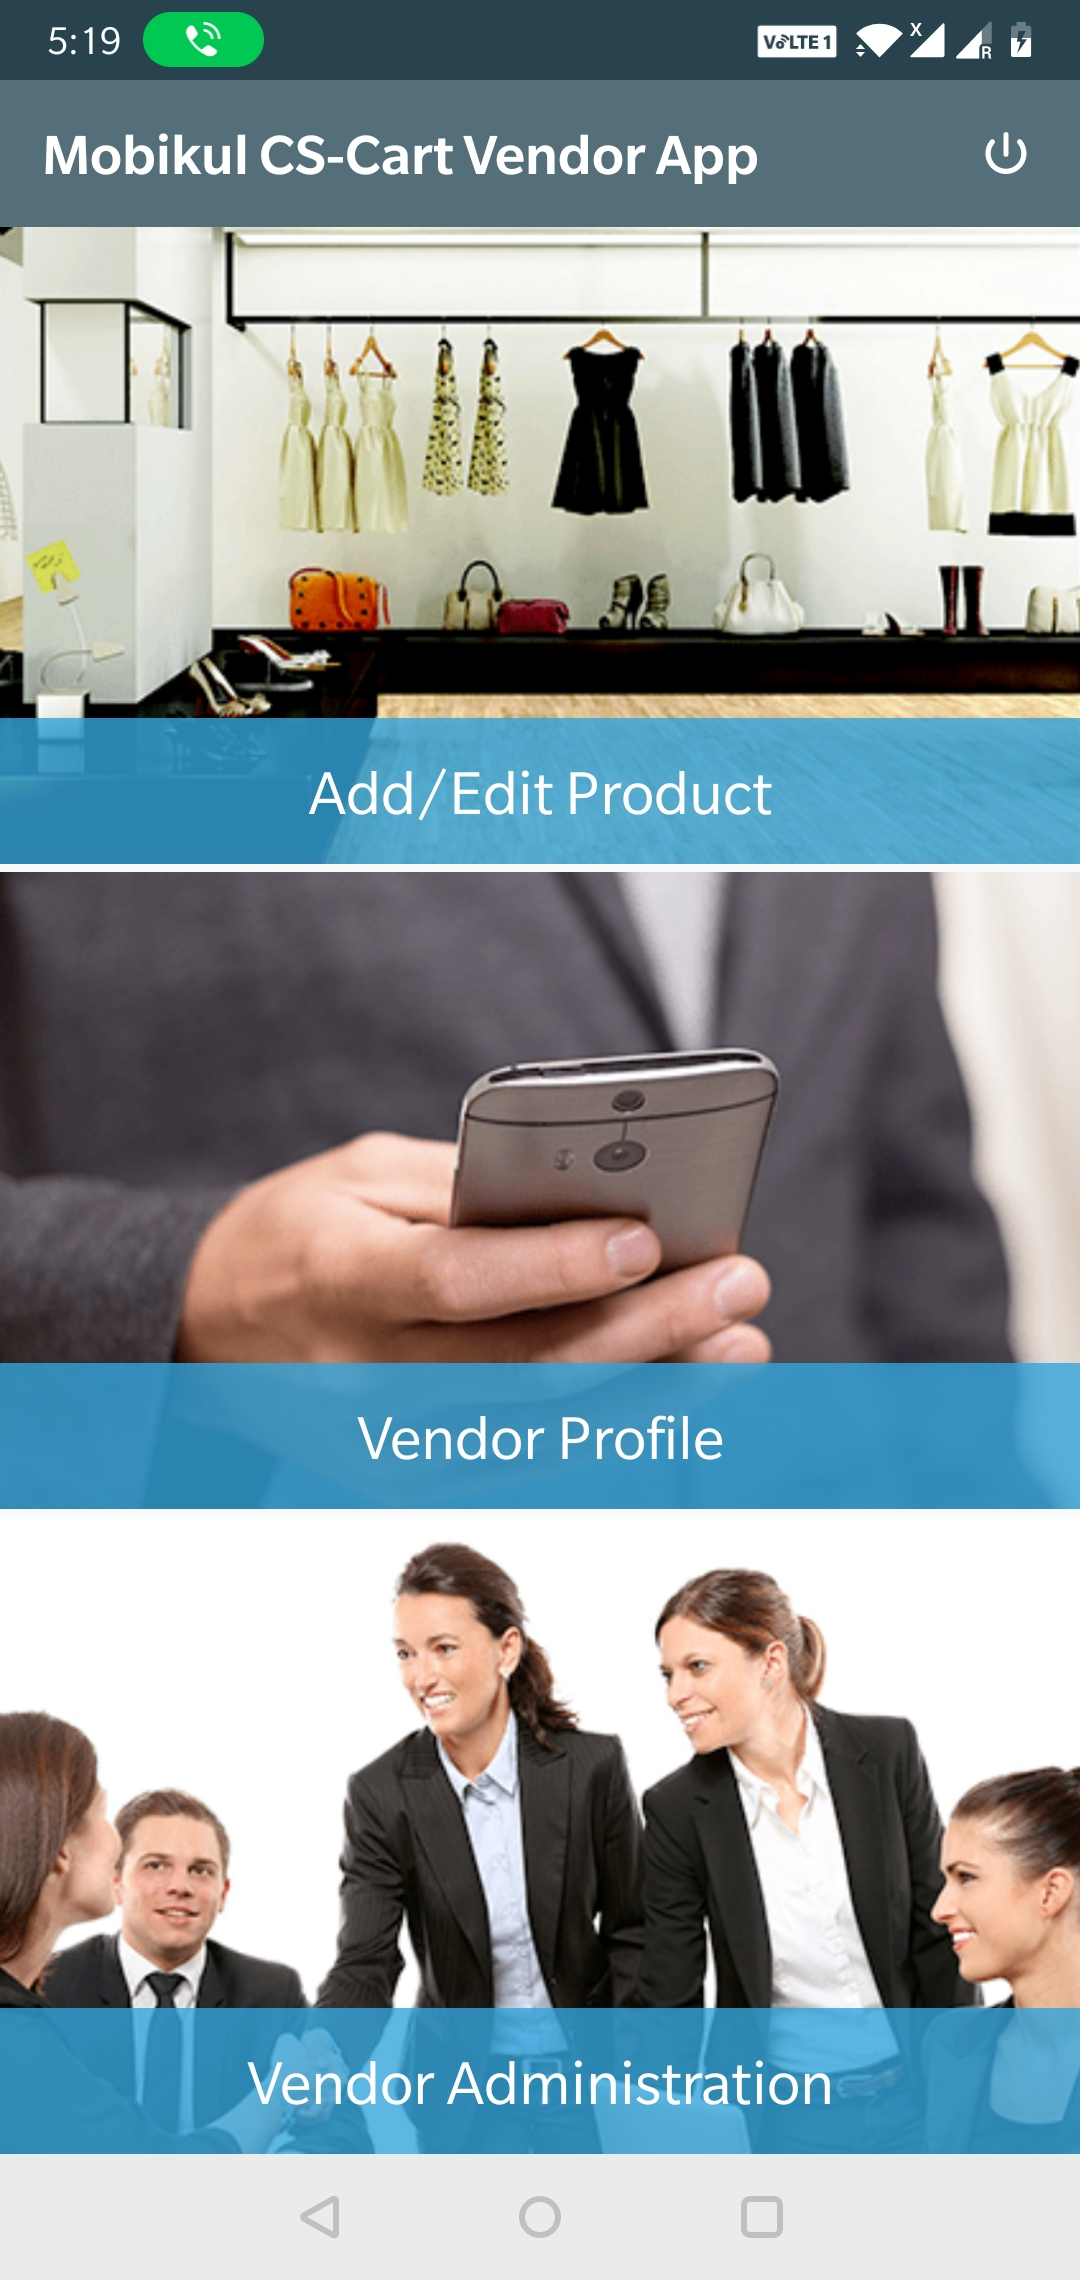 webkul-mobikul-cs-cart-vendor-app-Seller-Centric-features-3